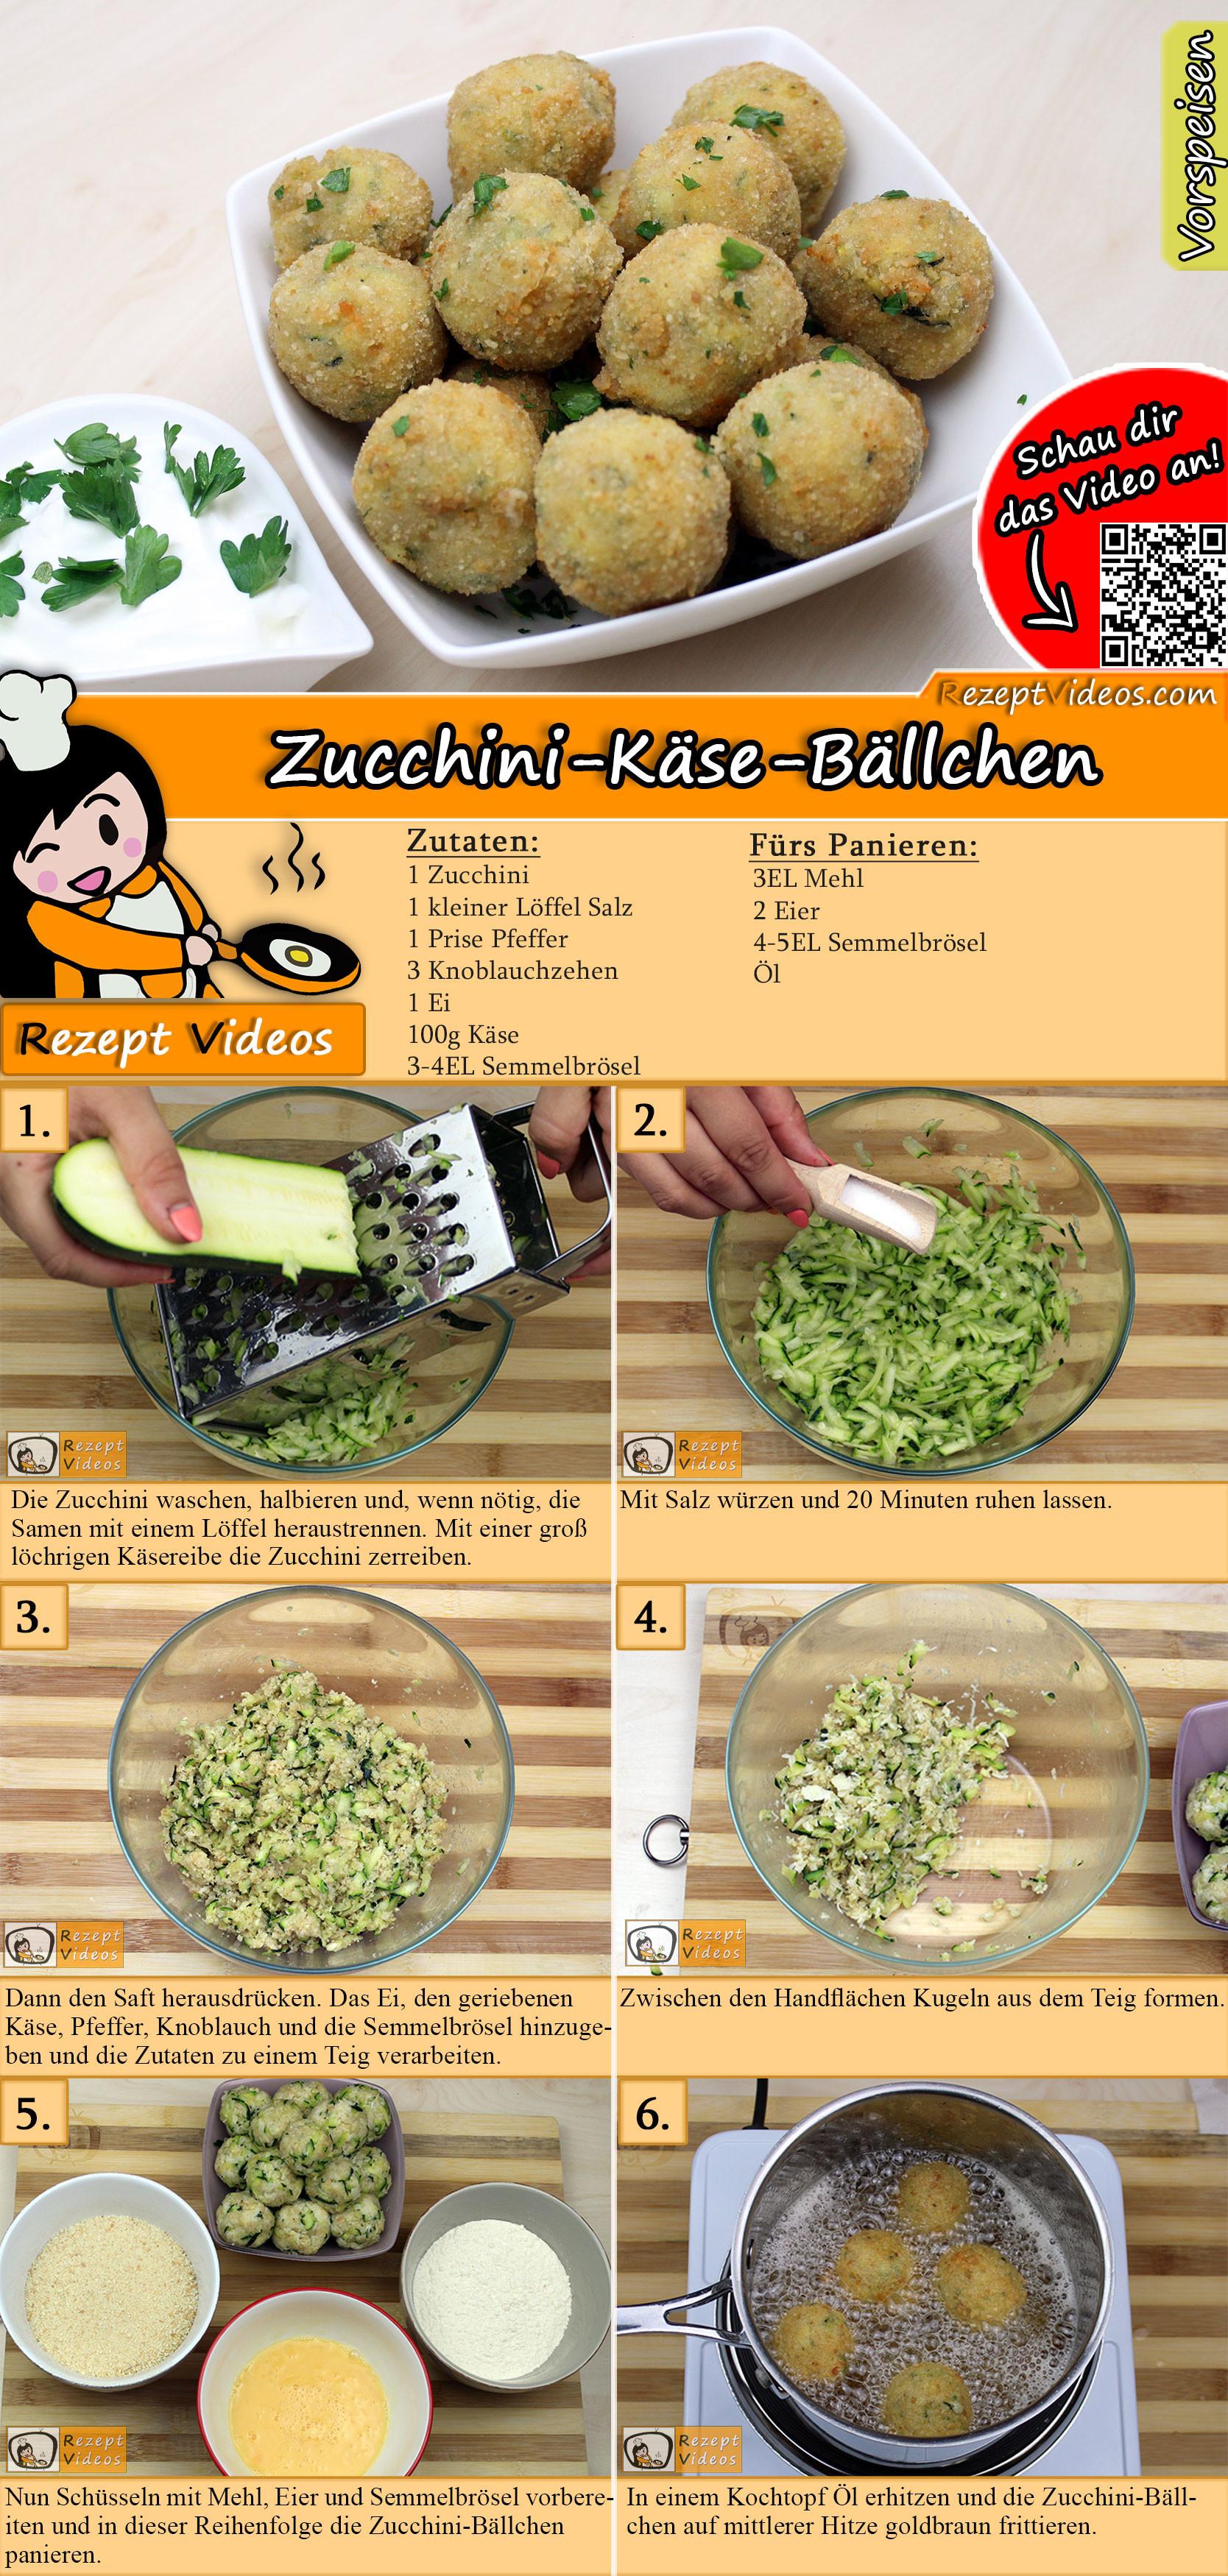 Zucchini-Käse-Bällchen Rezept mit Video